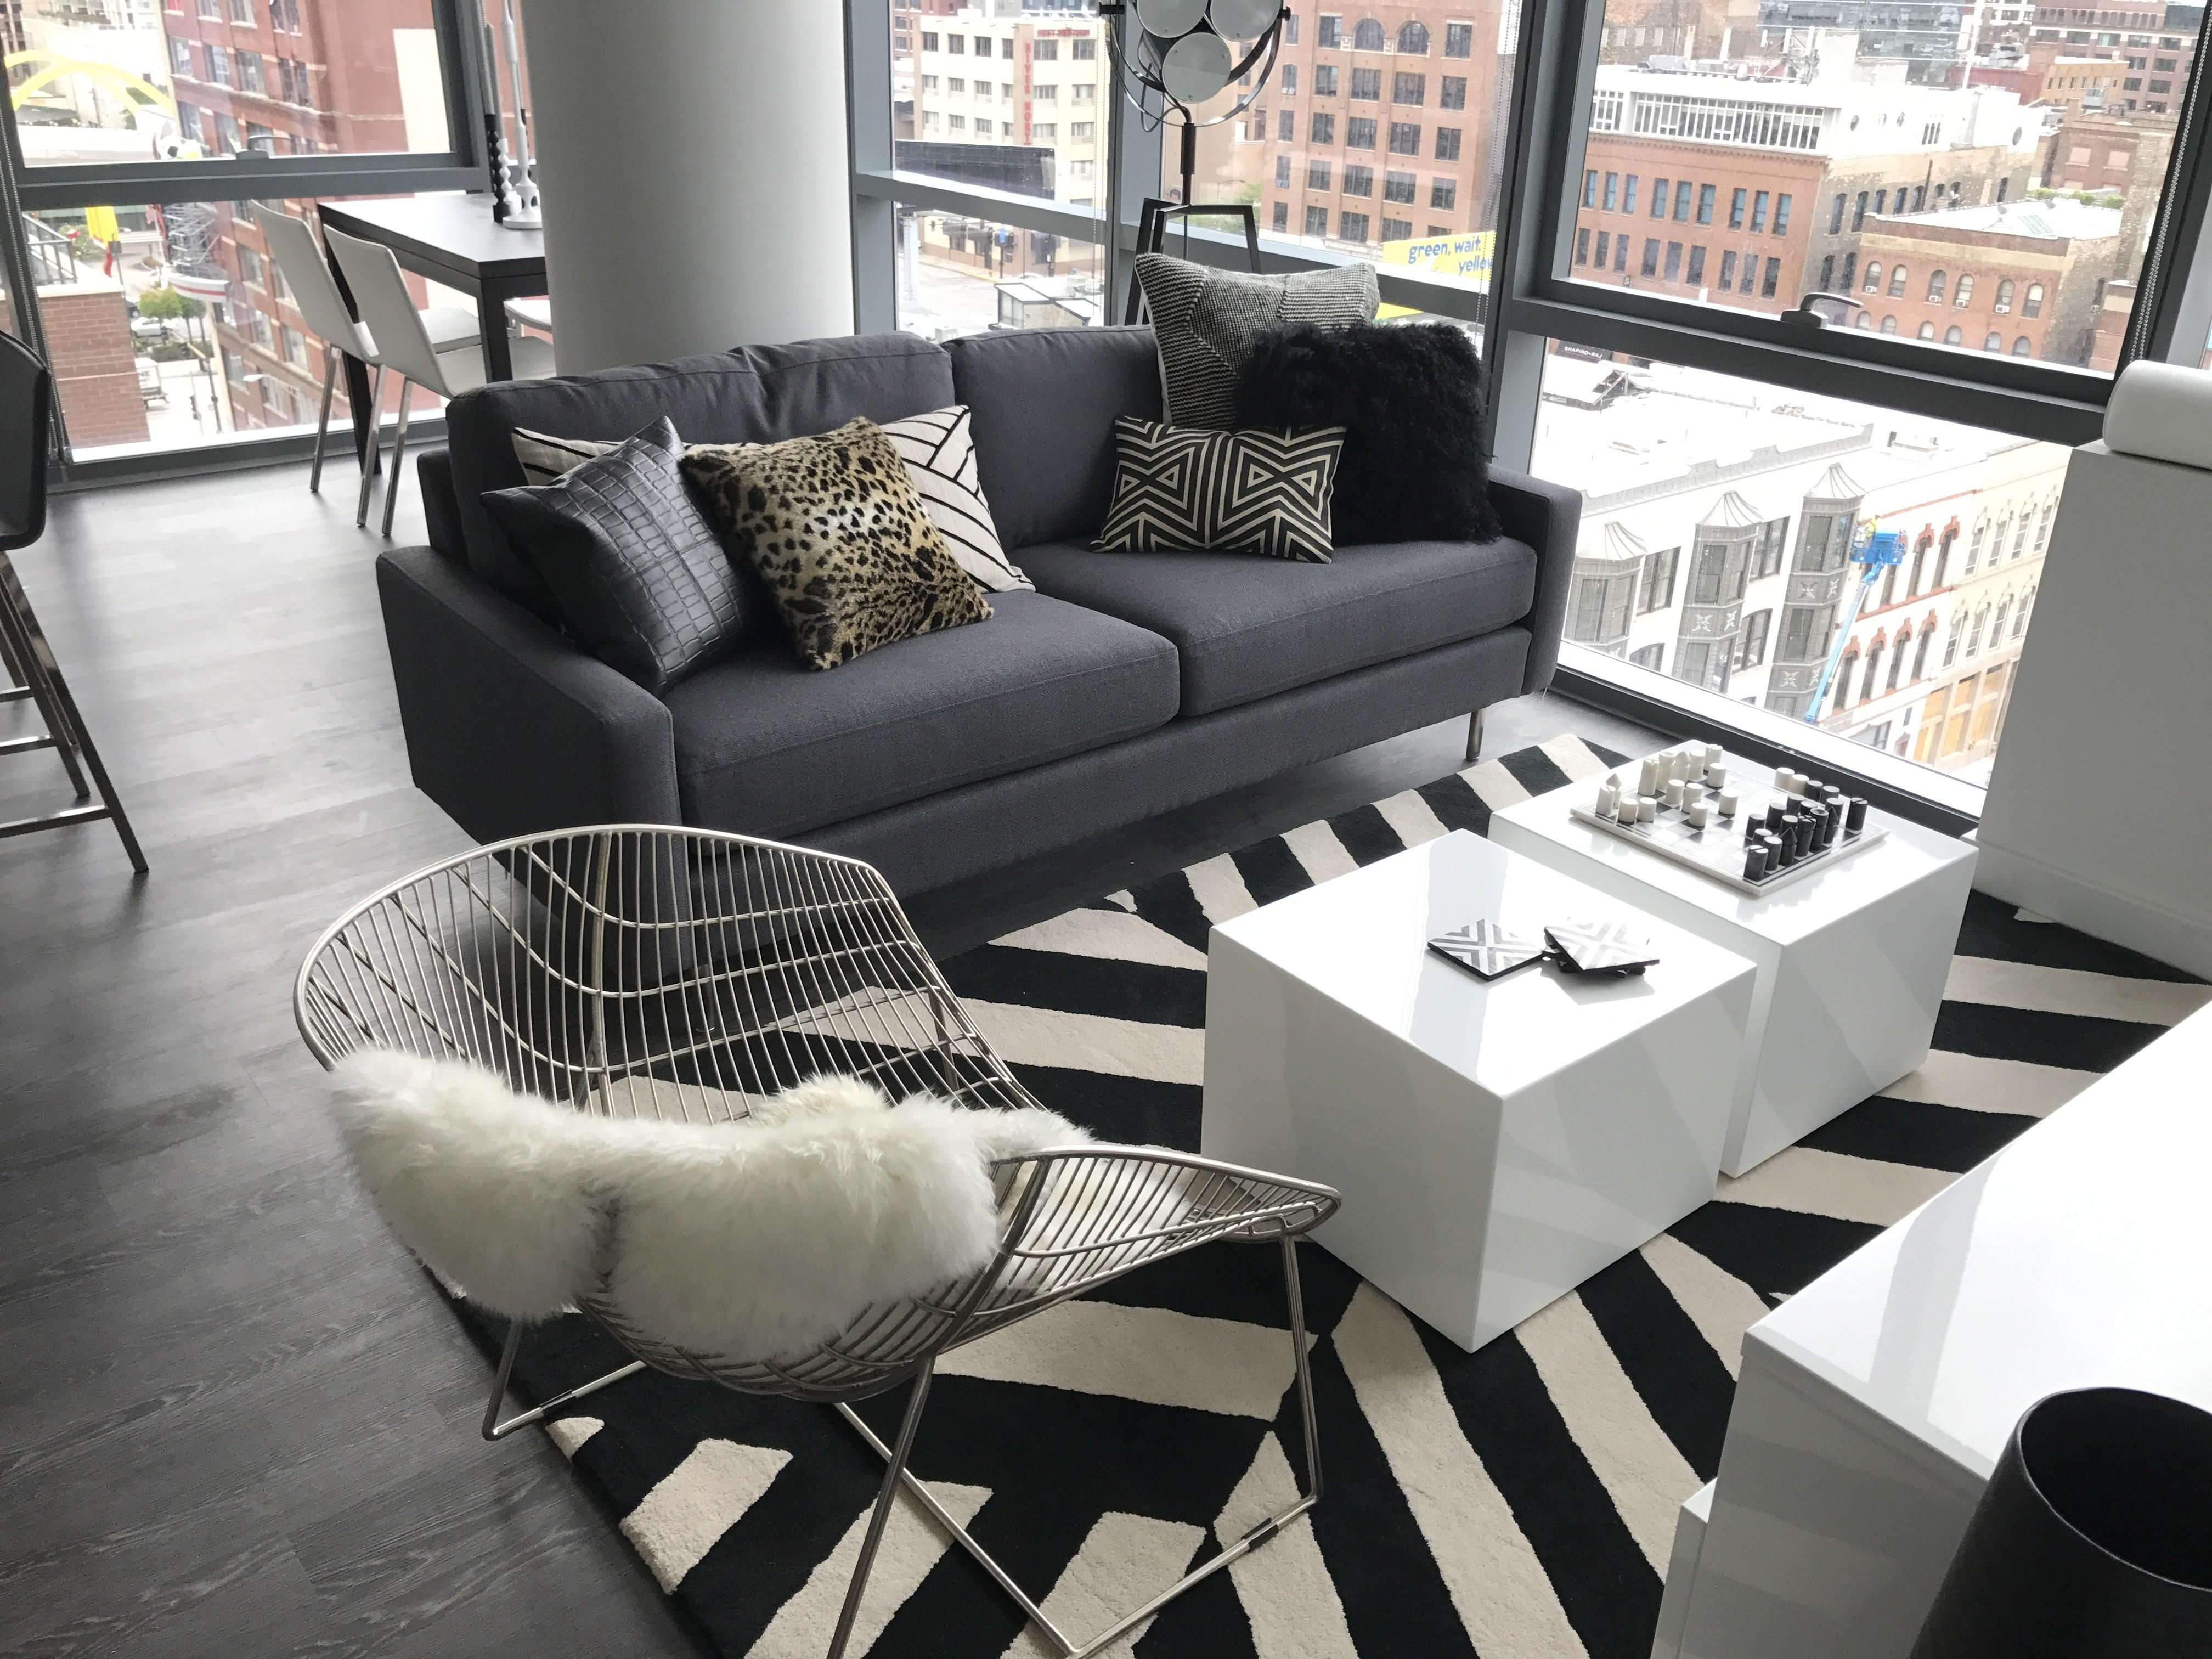 640 N Wells St Apartments, Chicago IL Walk Score